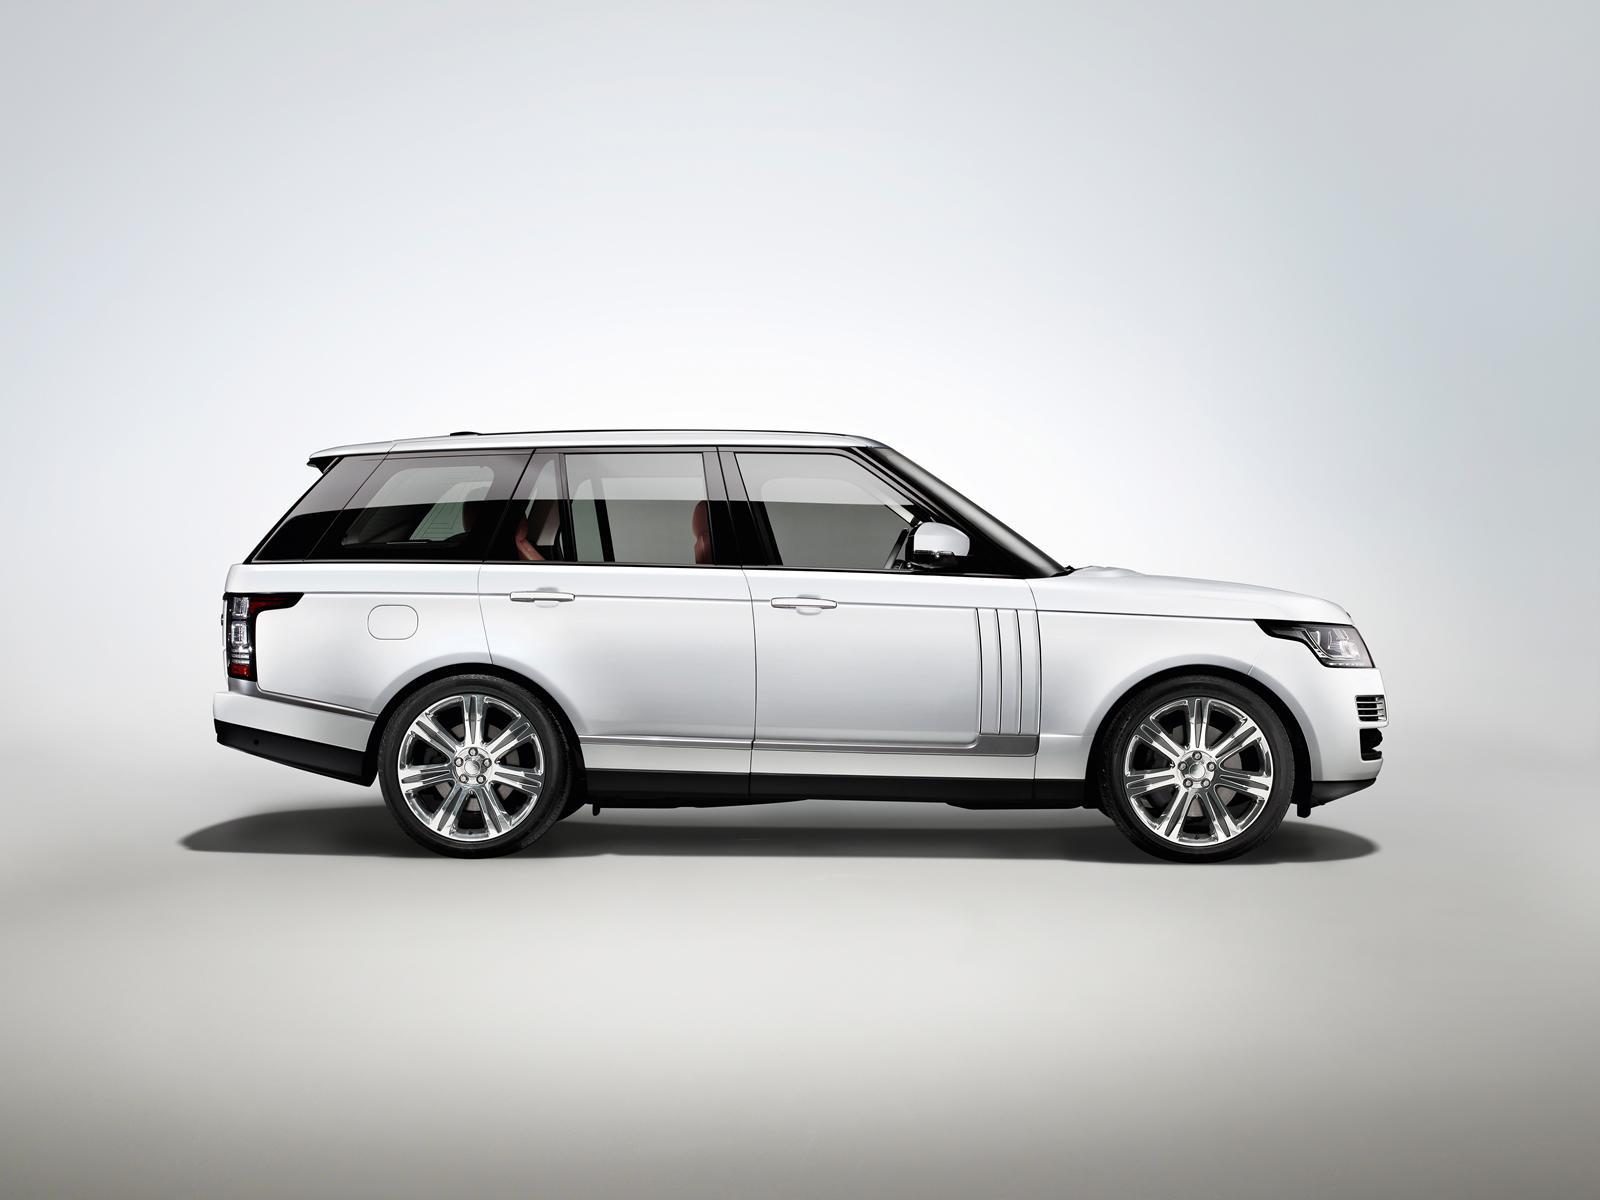 Land Rover Prepares More Luxurious Range Rover the